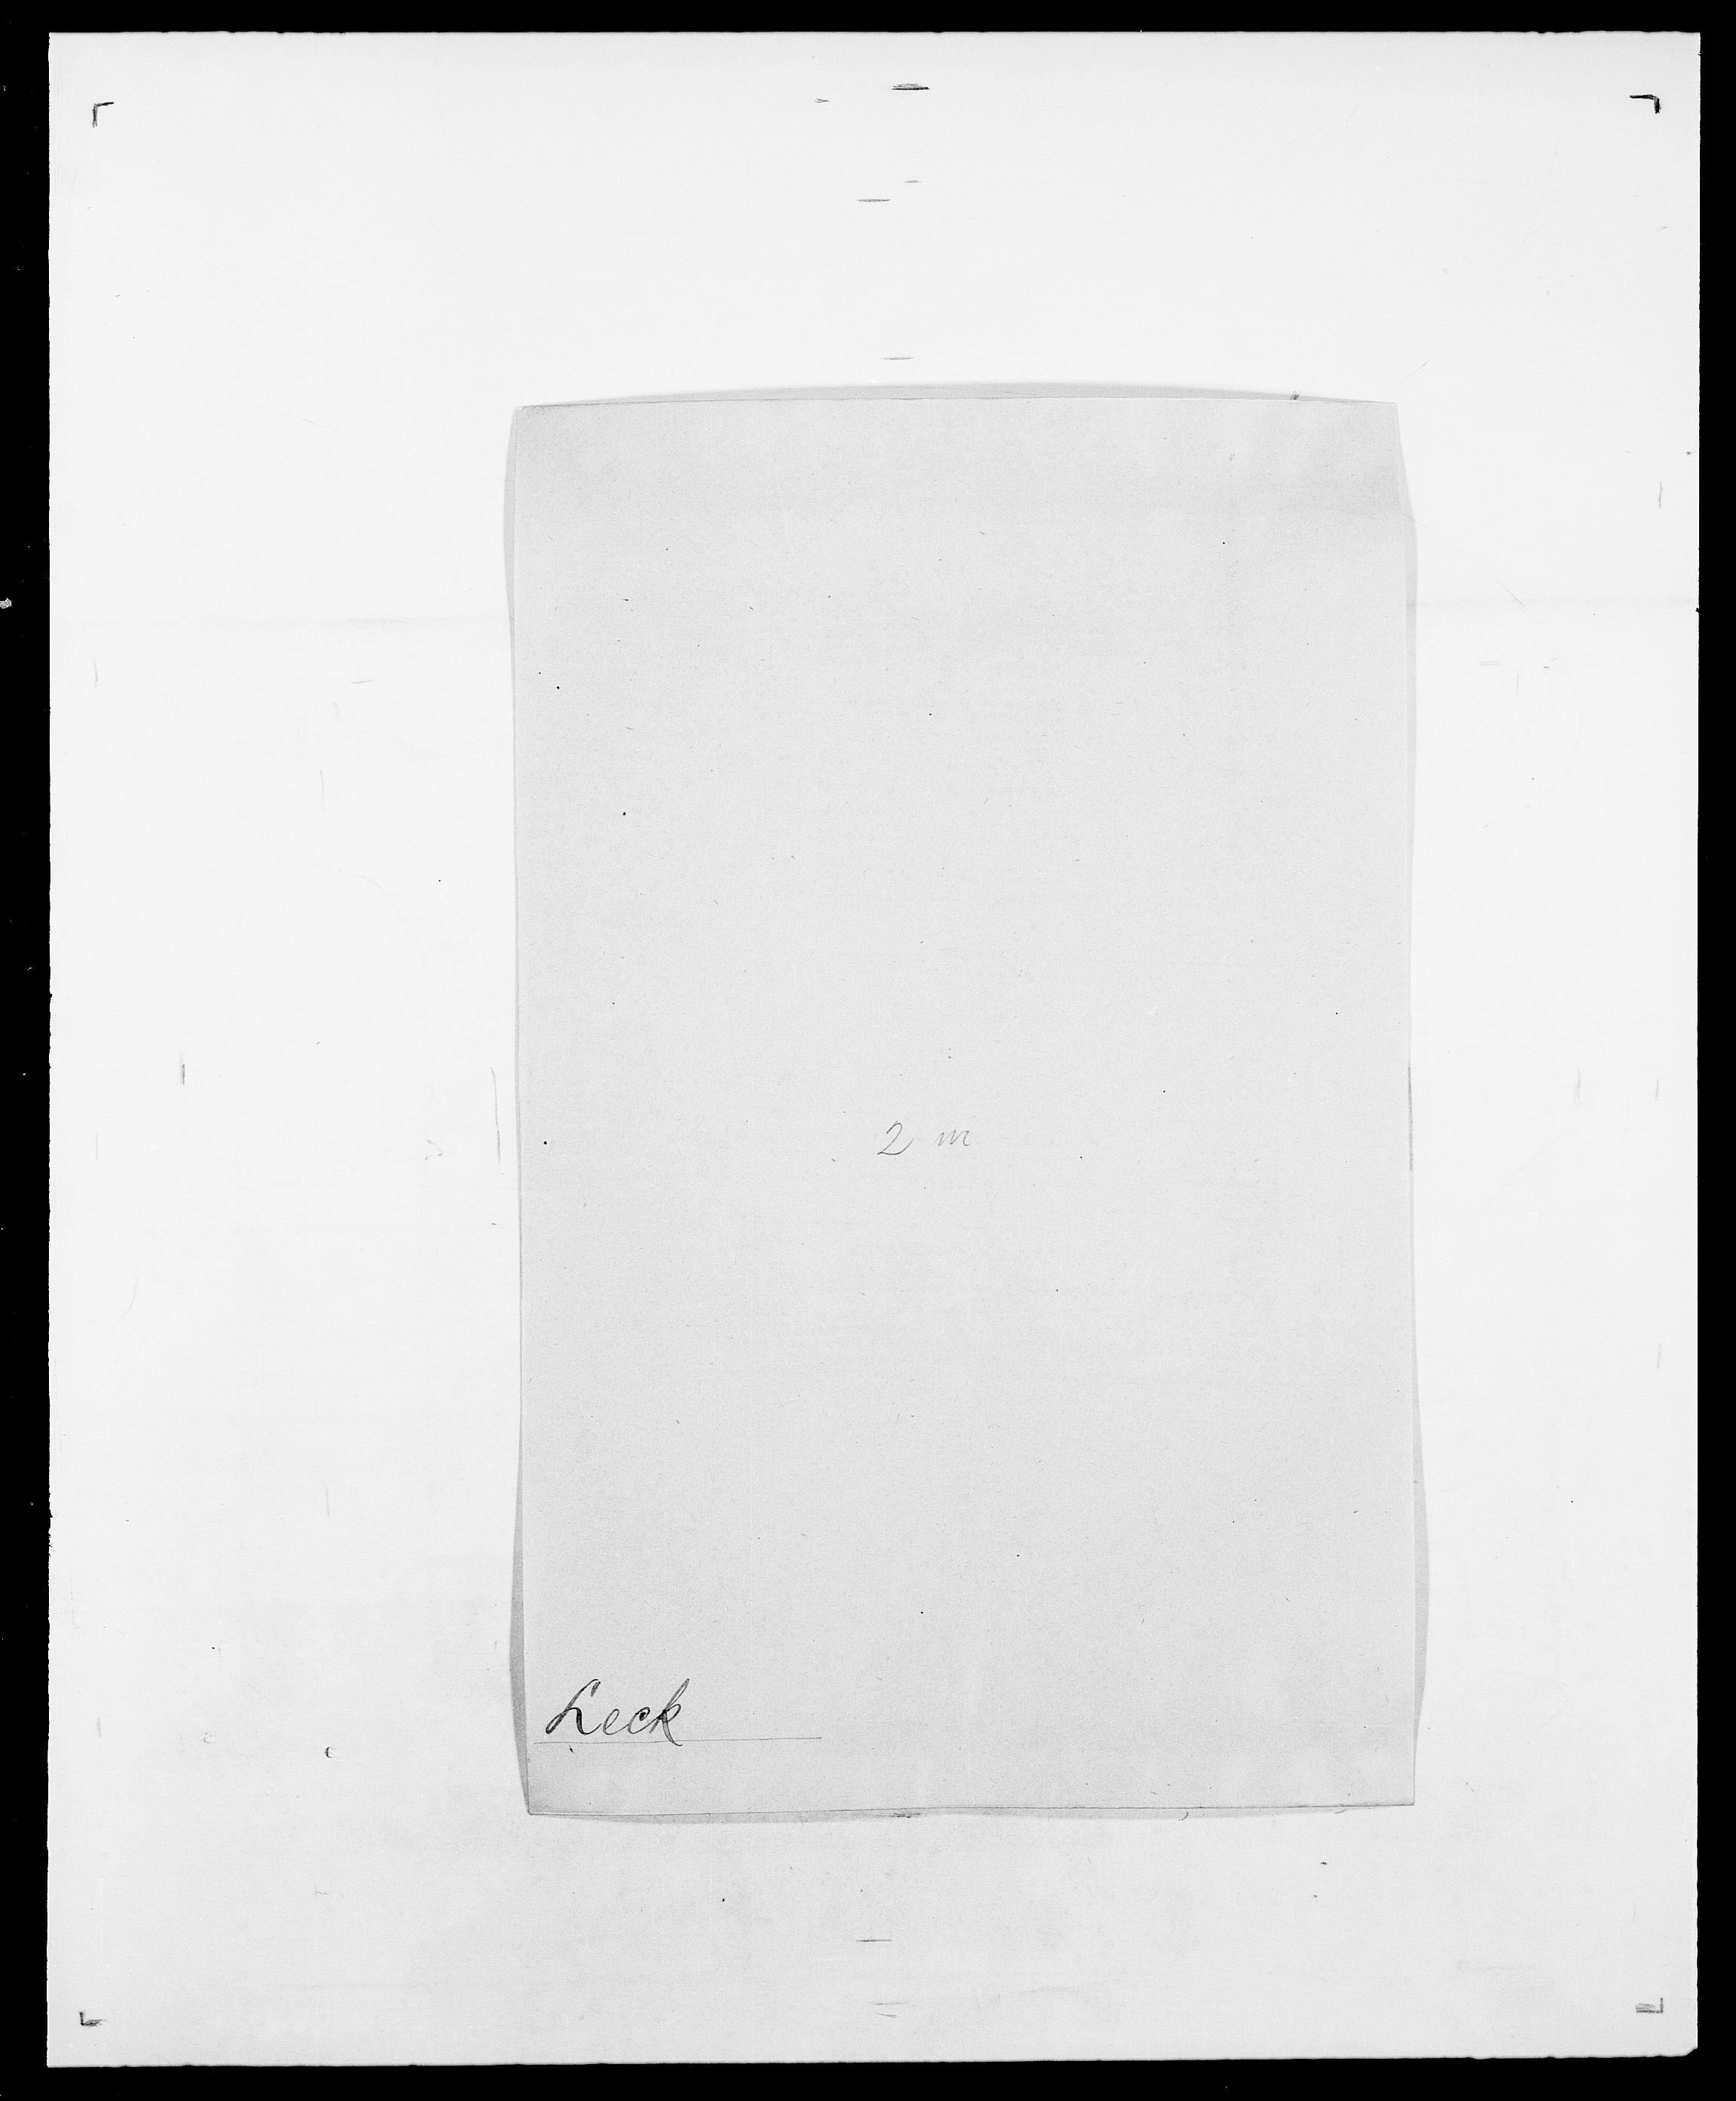 SAO, Delgobe, Charles Antoine - samling, D/Da/L0023: Lau - Lirvyn, s. 55